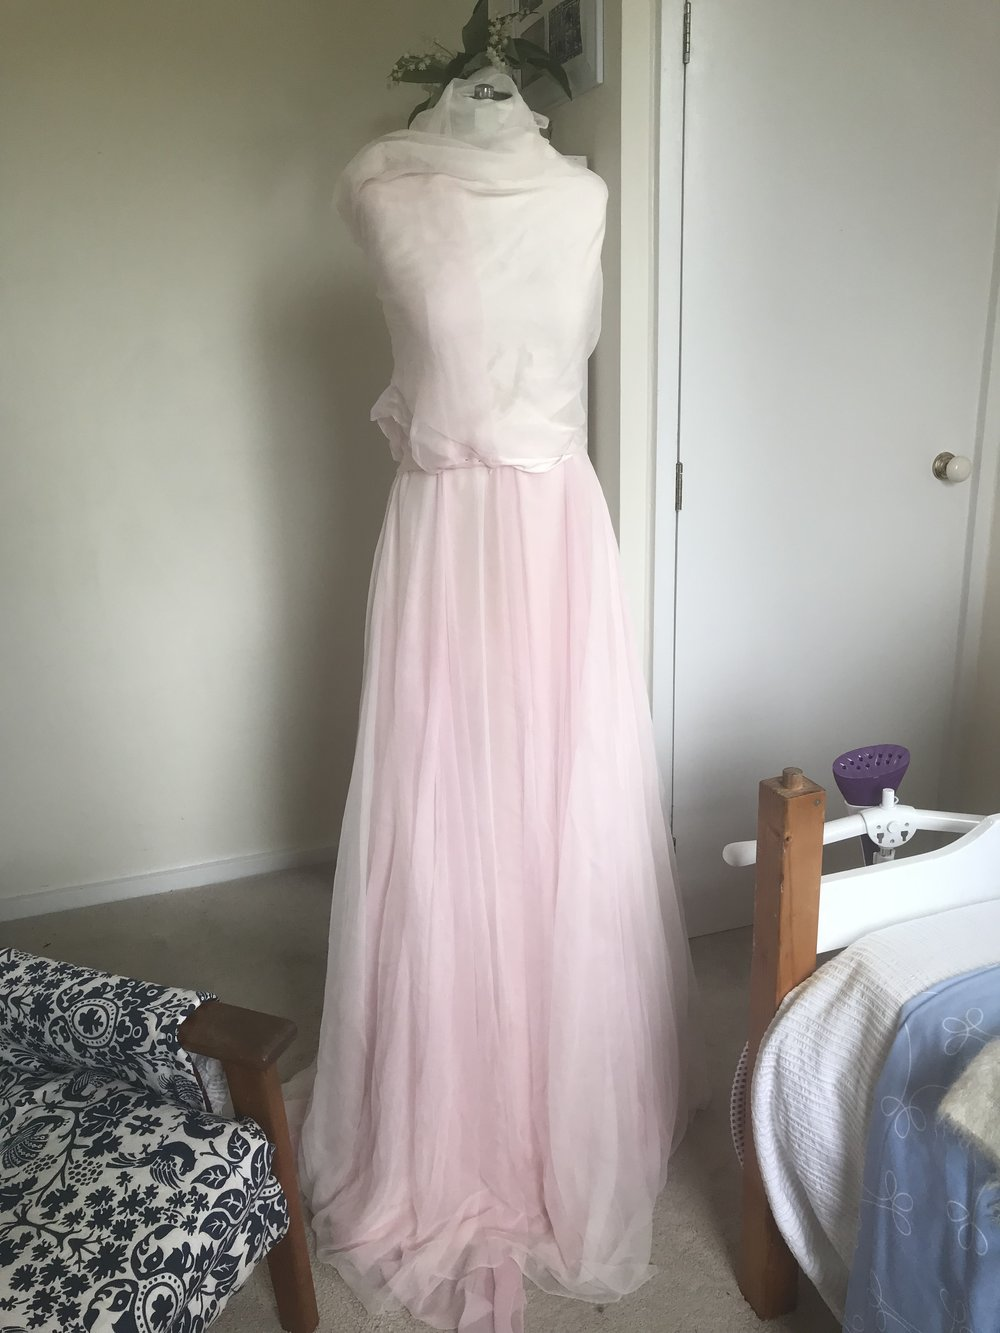 Skirt Layer 3: Ivory Silk Gauze